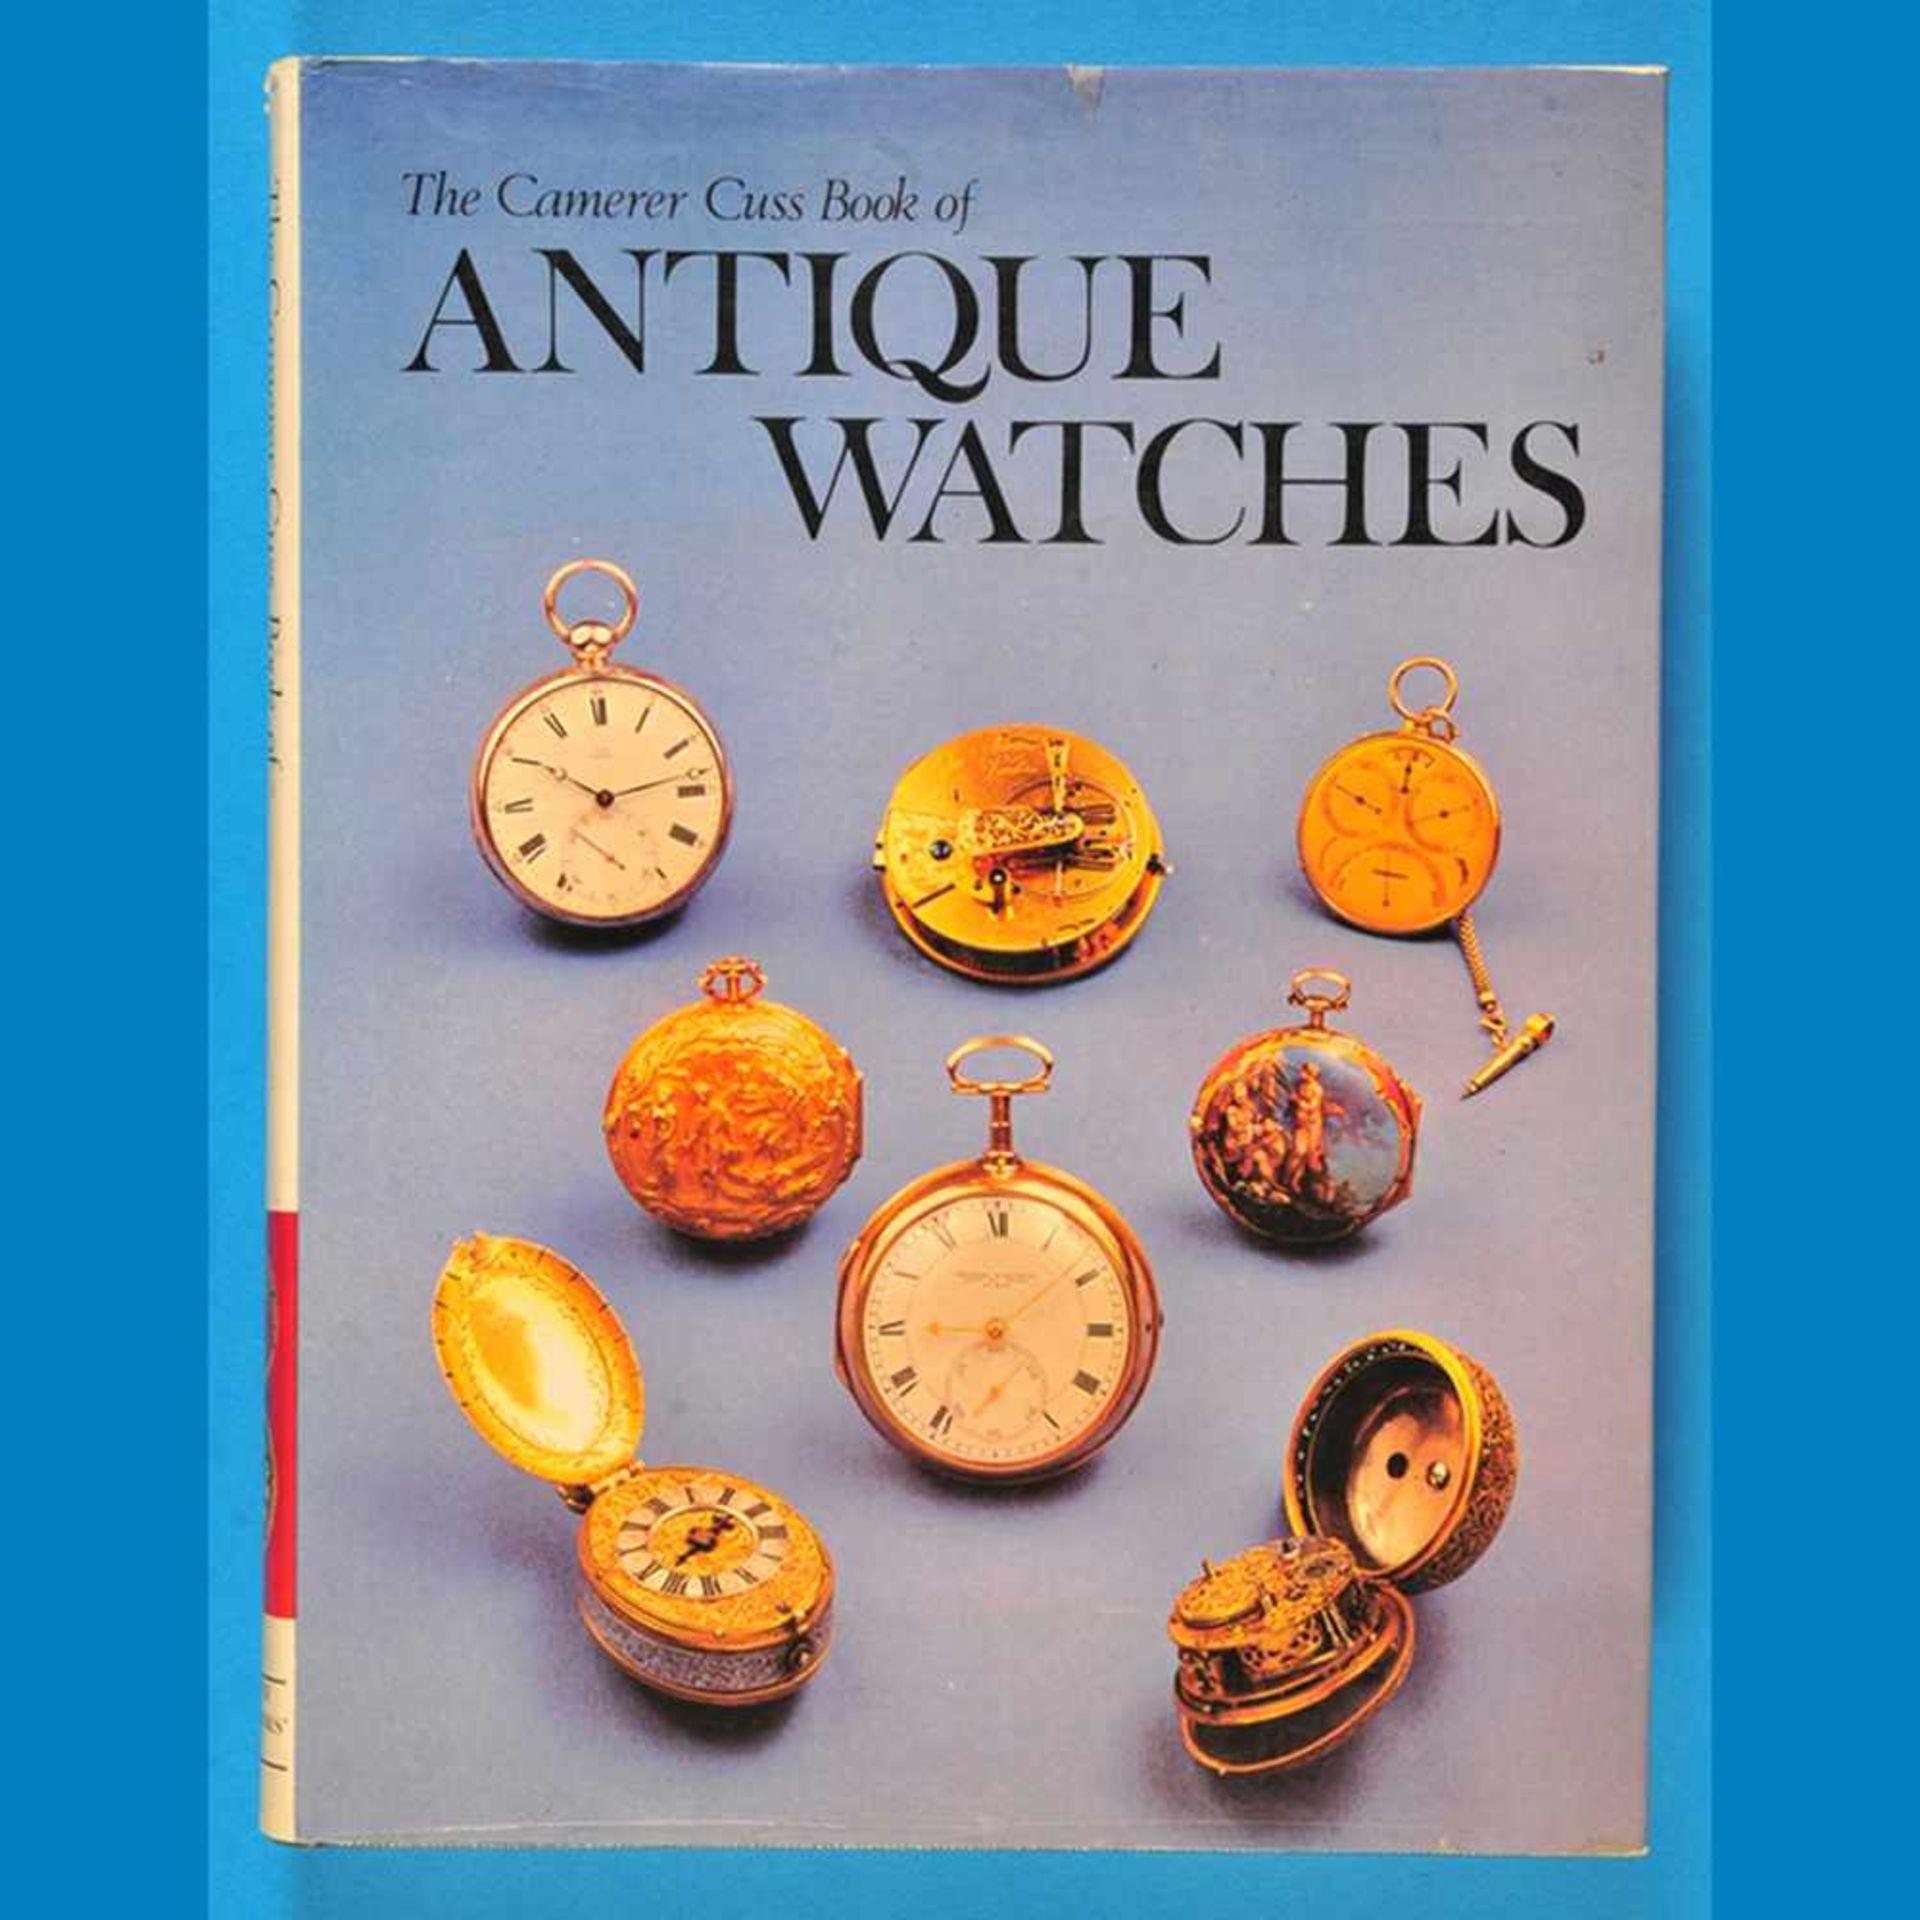 T. P. Camerer Cuss, Antique Watches, 1976T. P. Camerer Cuss, Antique Watches, 1976, 332 Sei